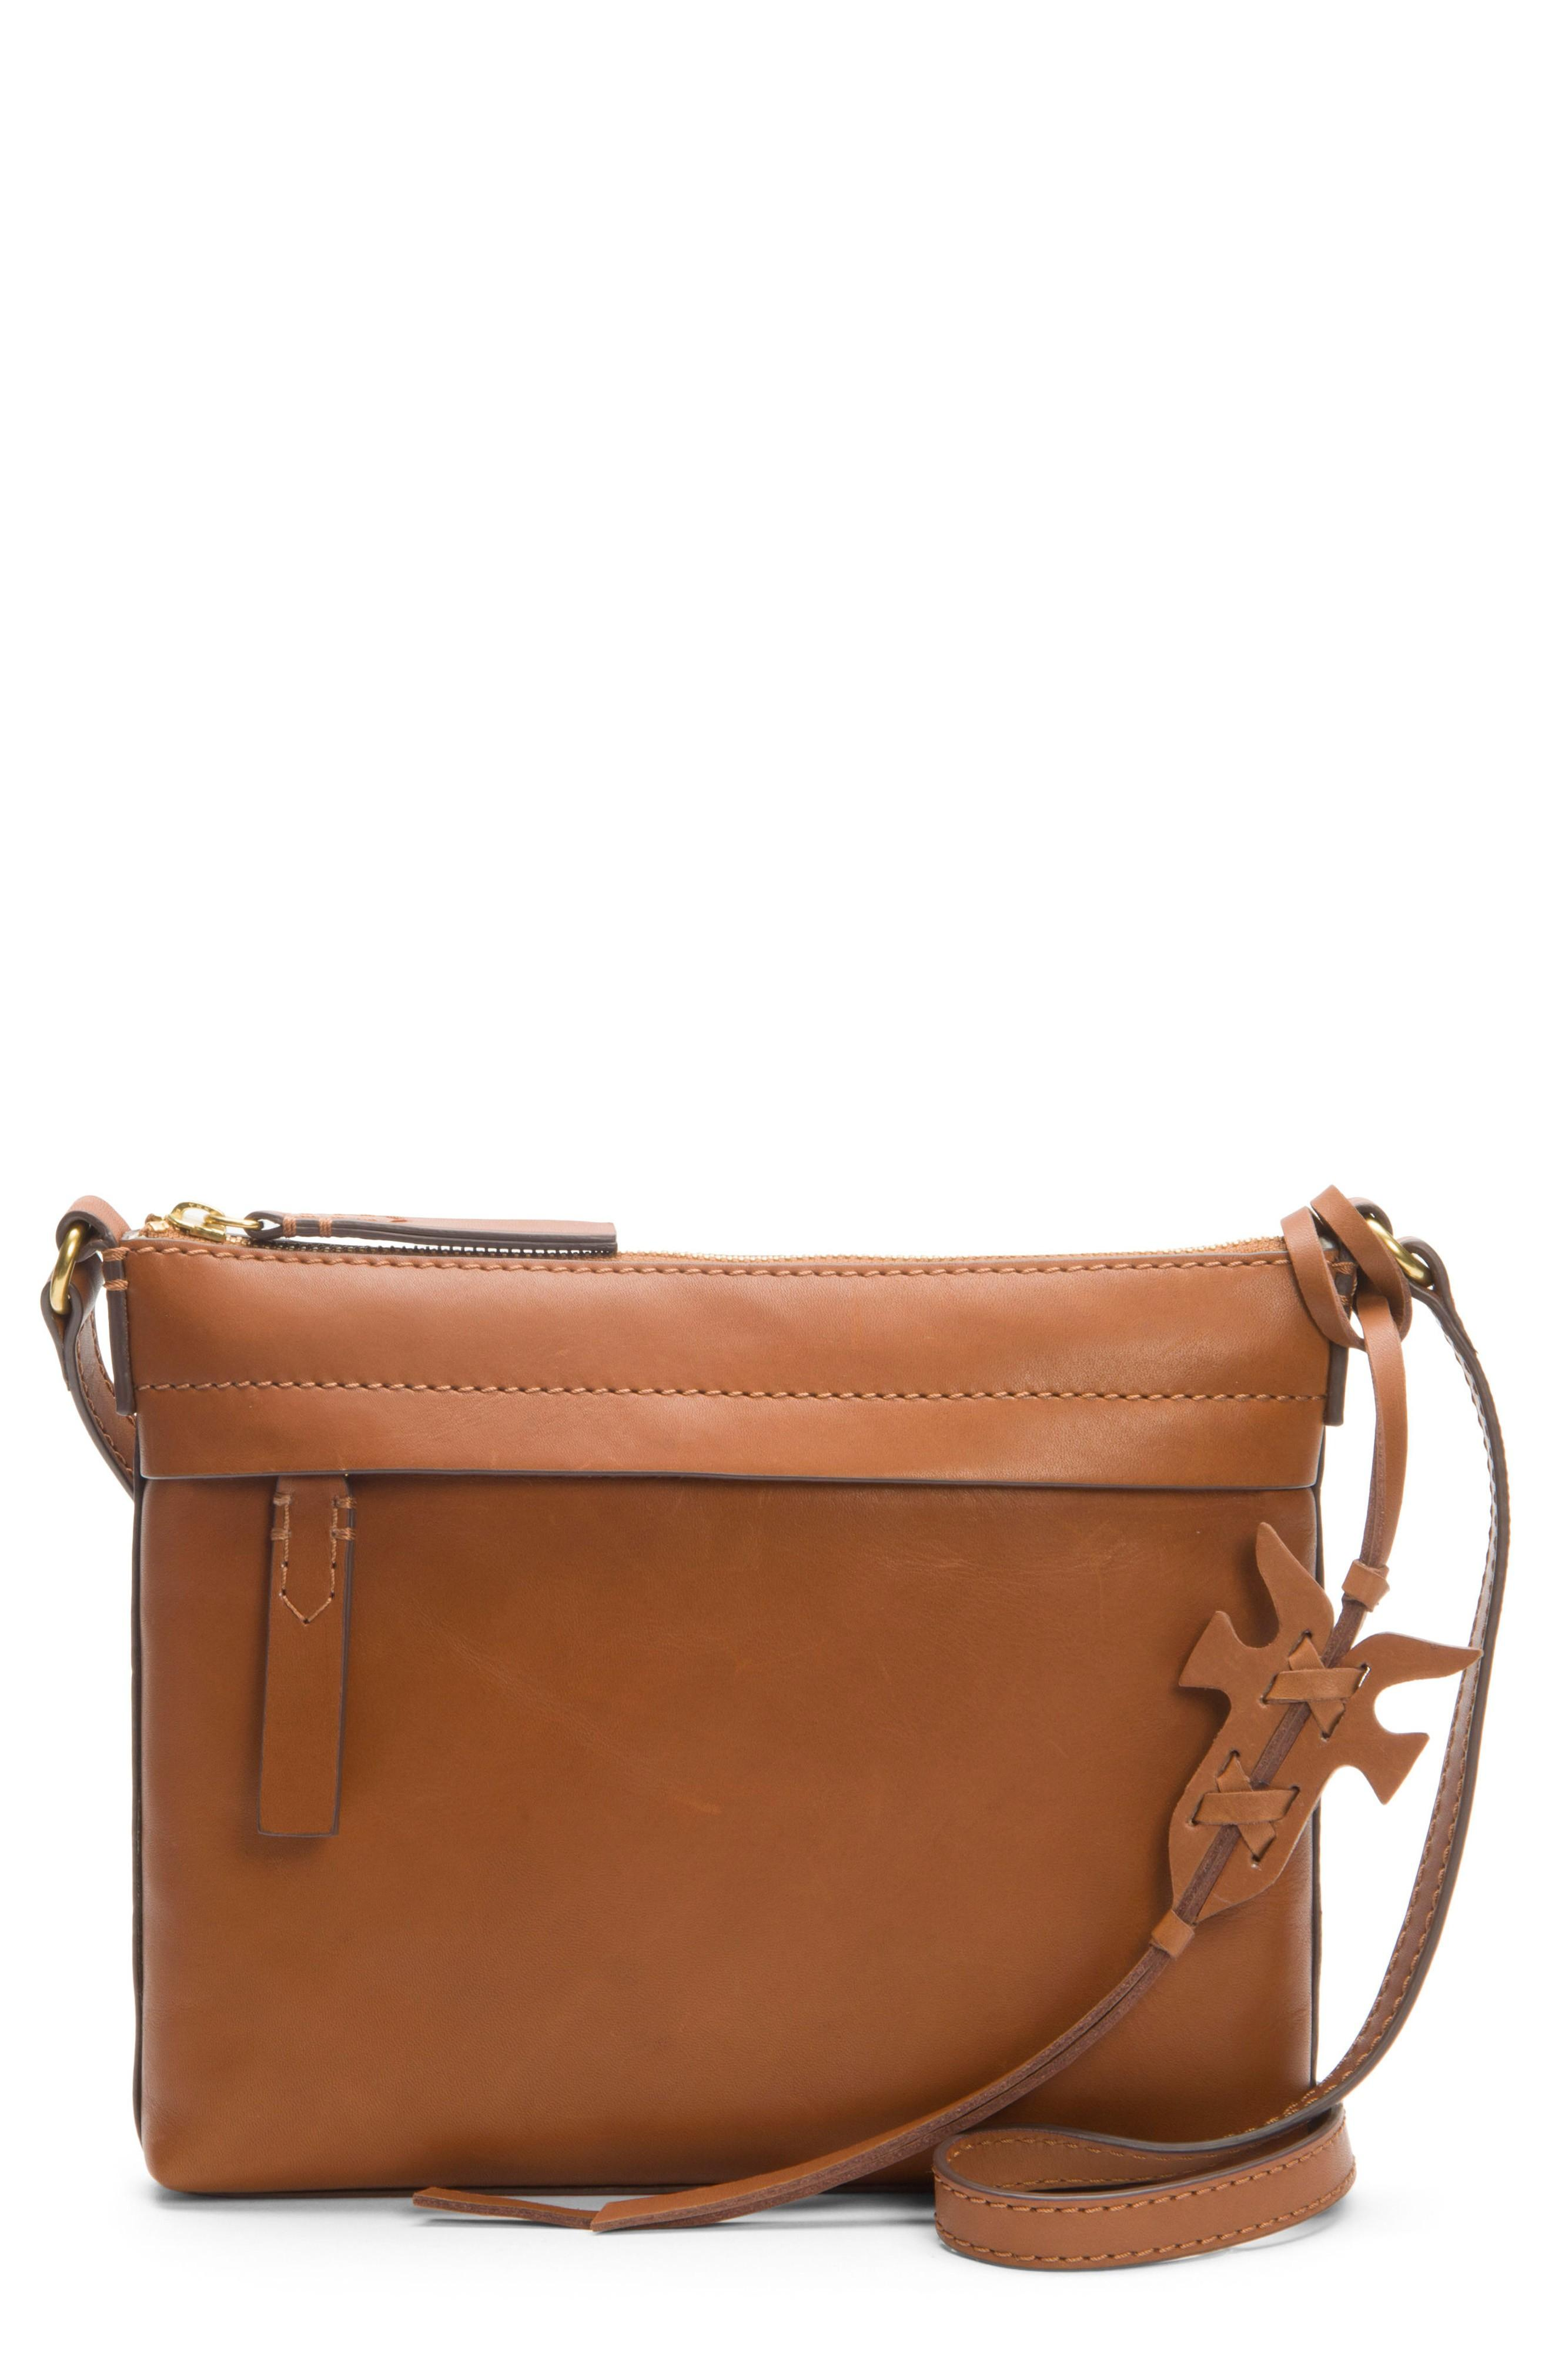 Frye Carson Leather Crossbody Bag - Brown In Cognac